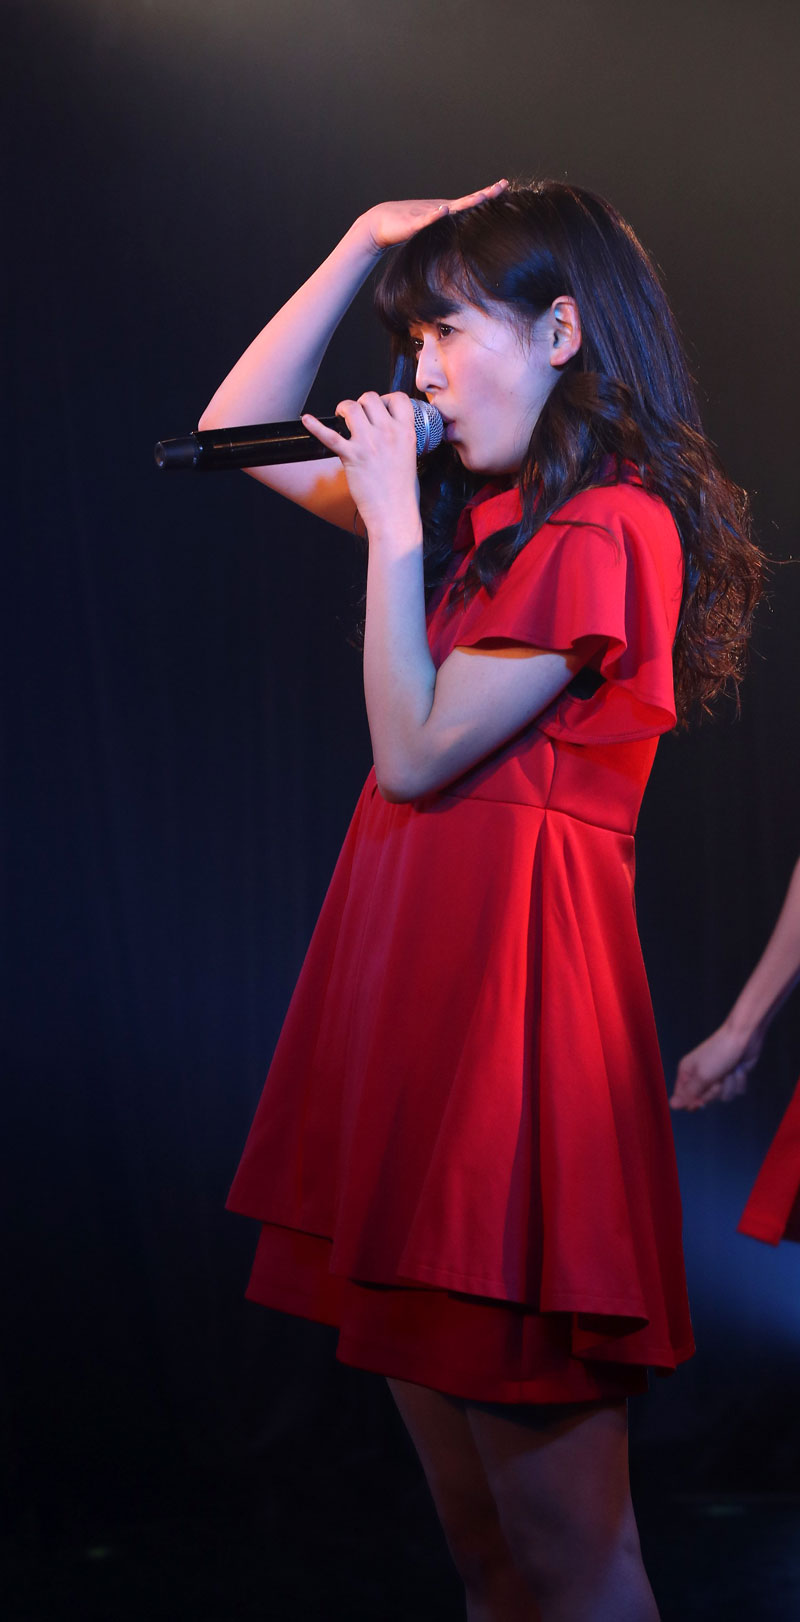 Images : 36番目の画像 - 「九州女子翼/定期公演第十四片inTOKYOは、いままでの成長を一気に開花させた極上のステージを構築」のアルバム - Stereo Sound ONLINE